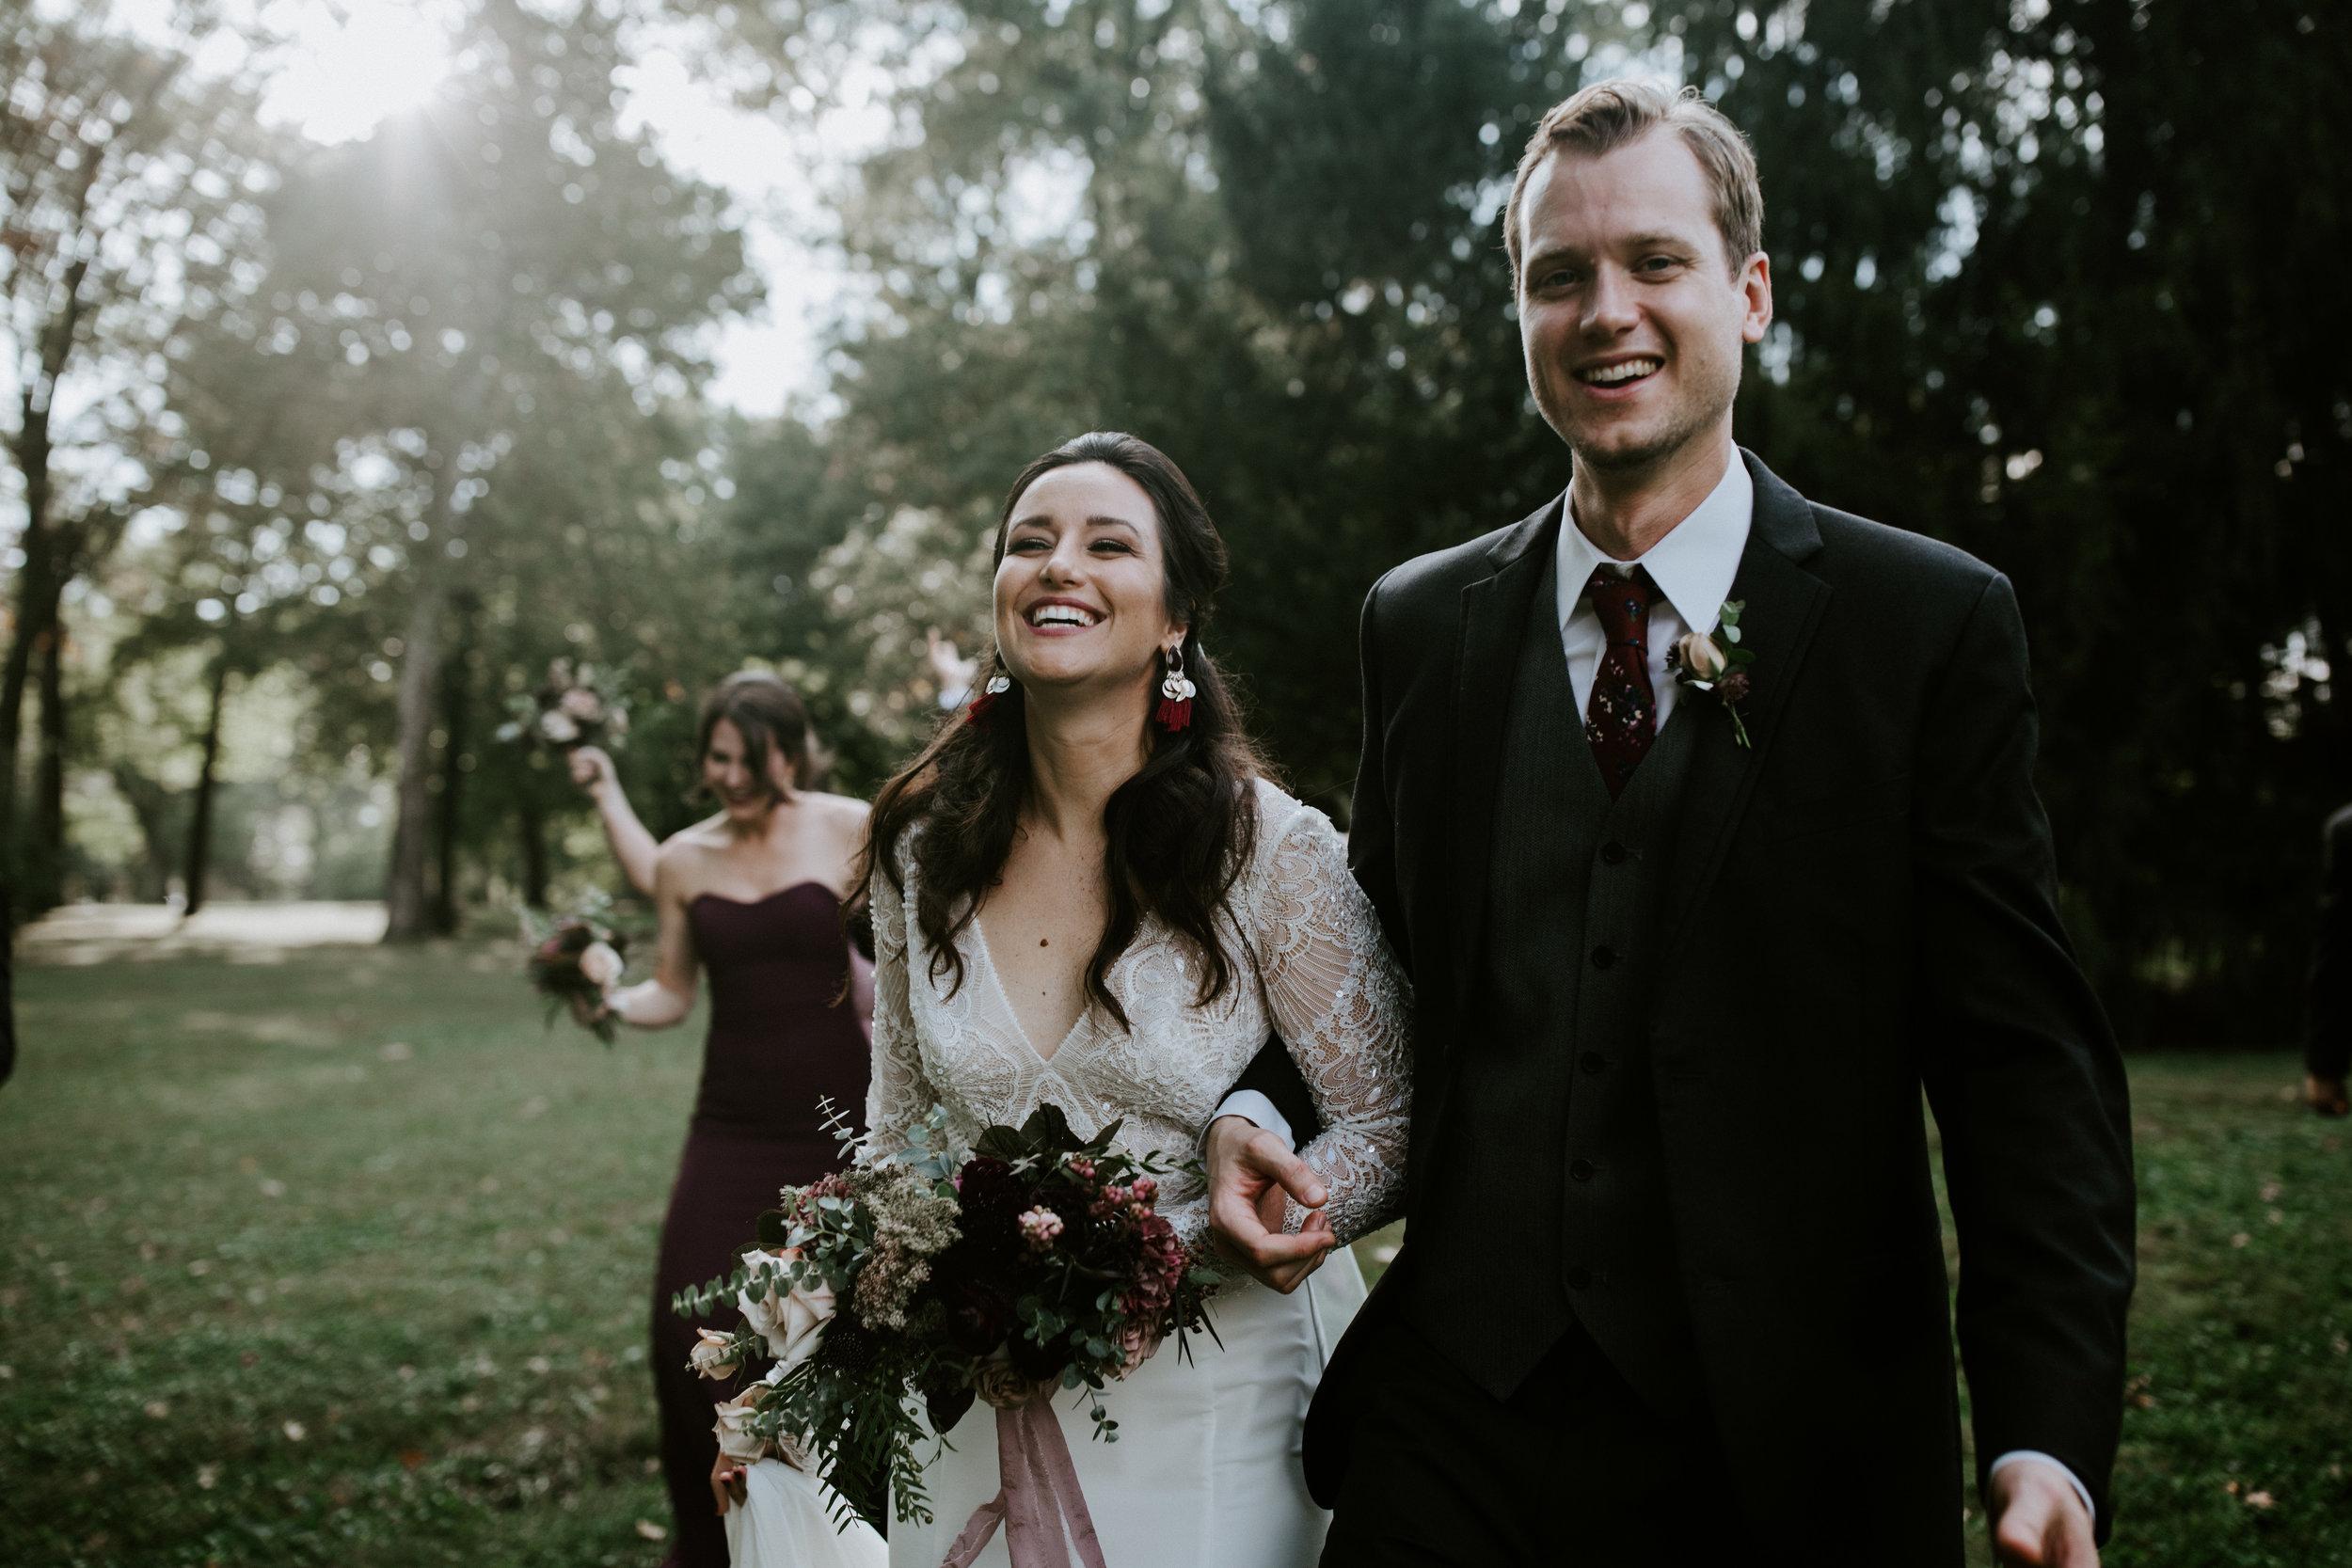 st-louis-missouri-wedding-photographer-tower-grove-park-sheldon-concert-hall-steph+phil-650.jpg